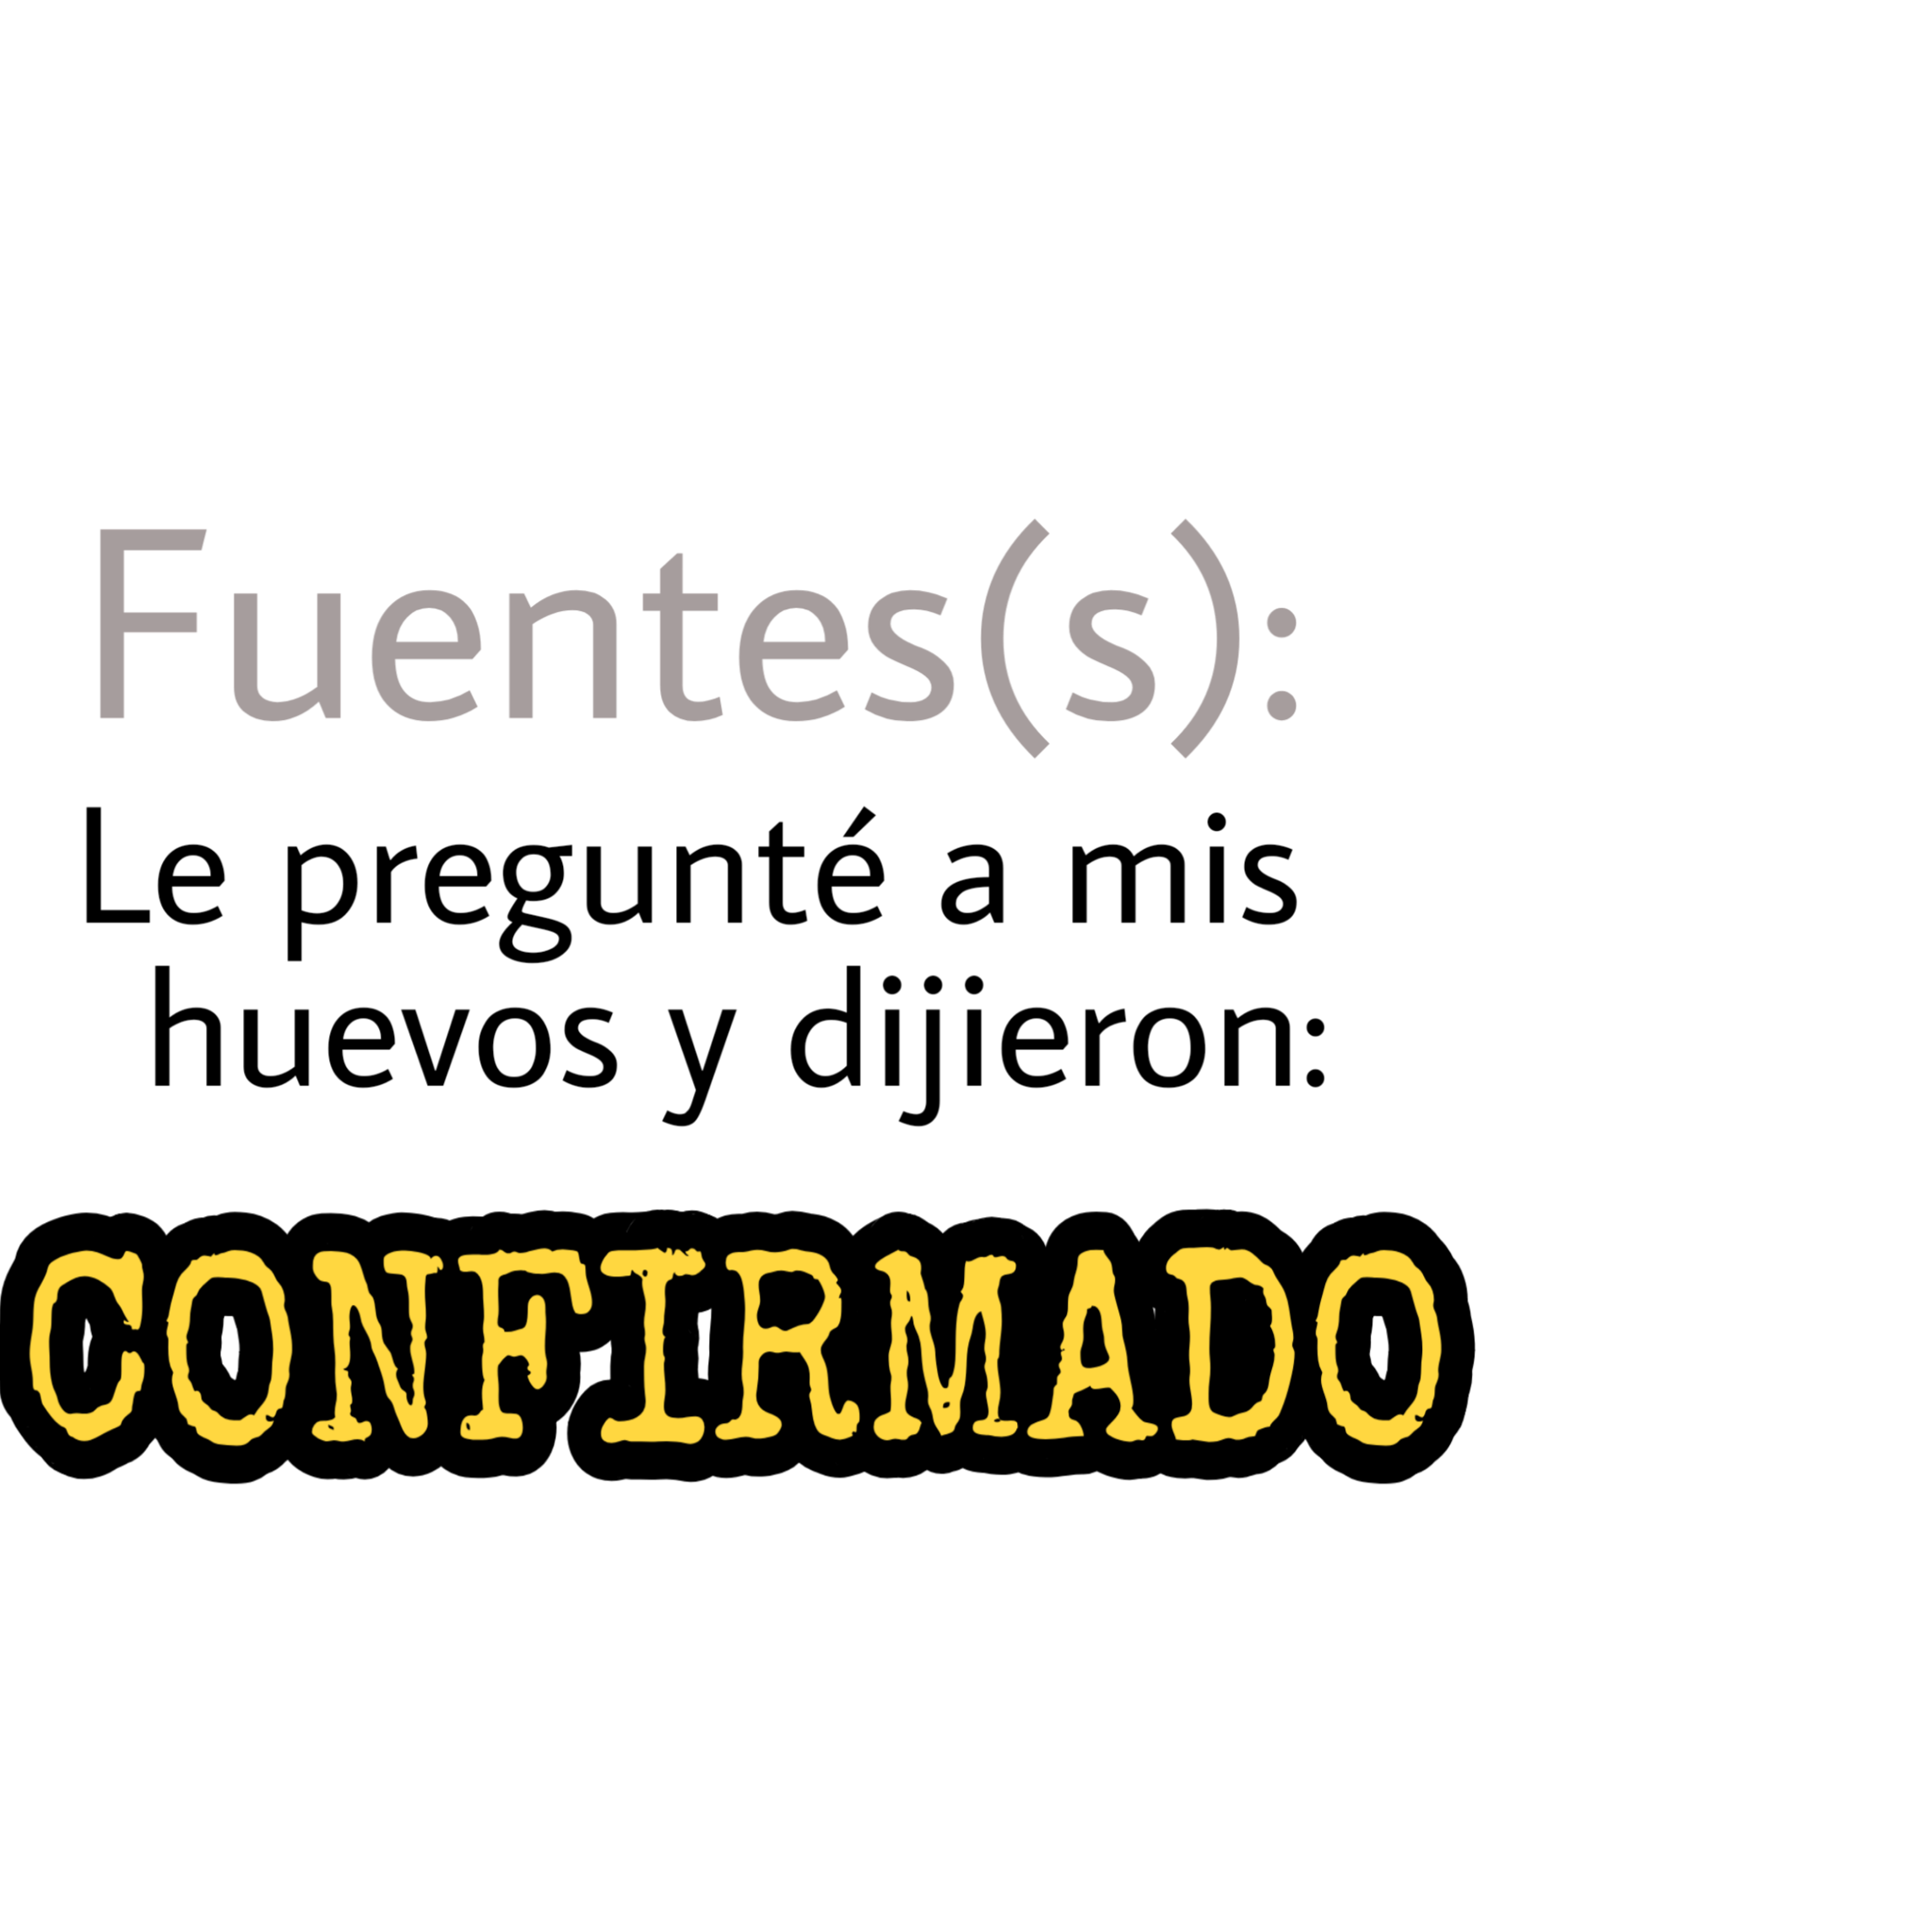 CONFIRMADO.